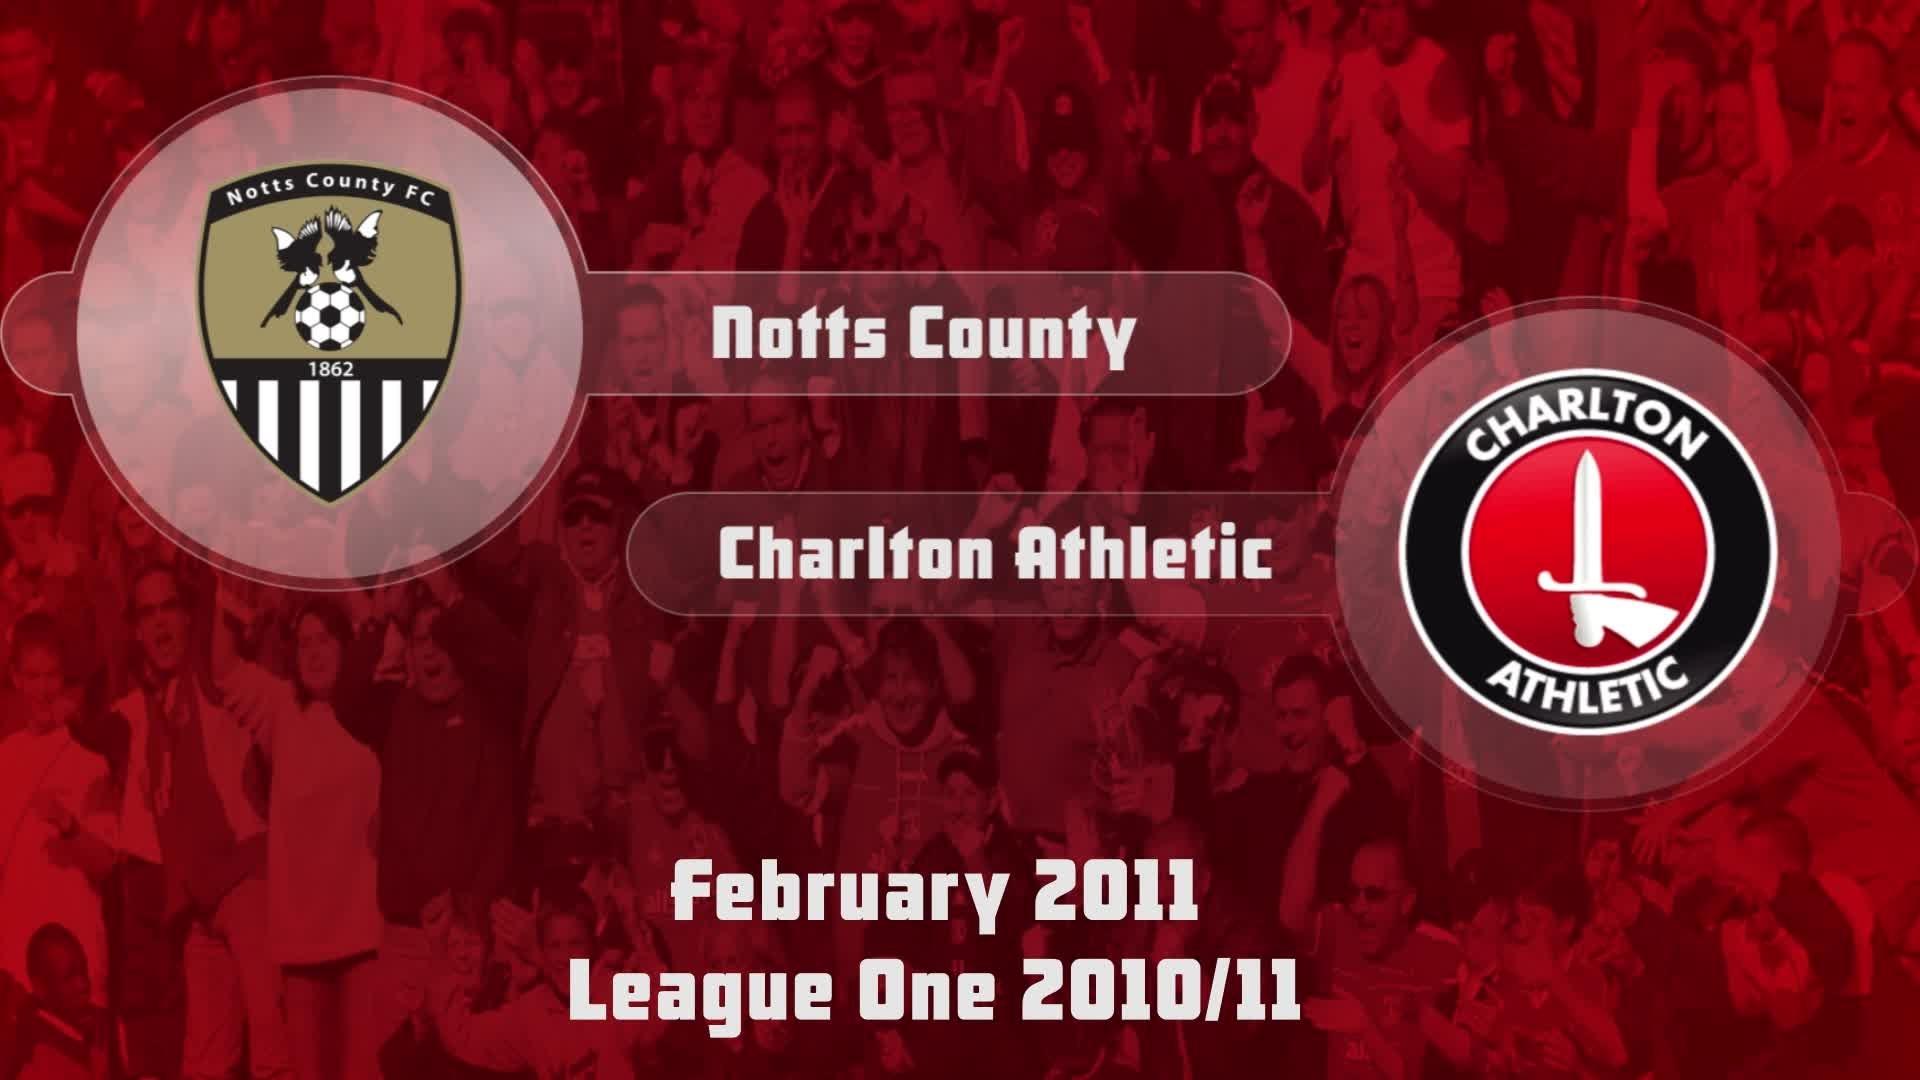 40 HIGHLIGHTS | Notts County 1 Charlton 0 (Feb 2011)